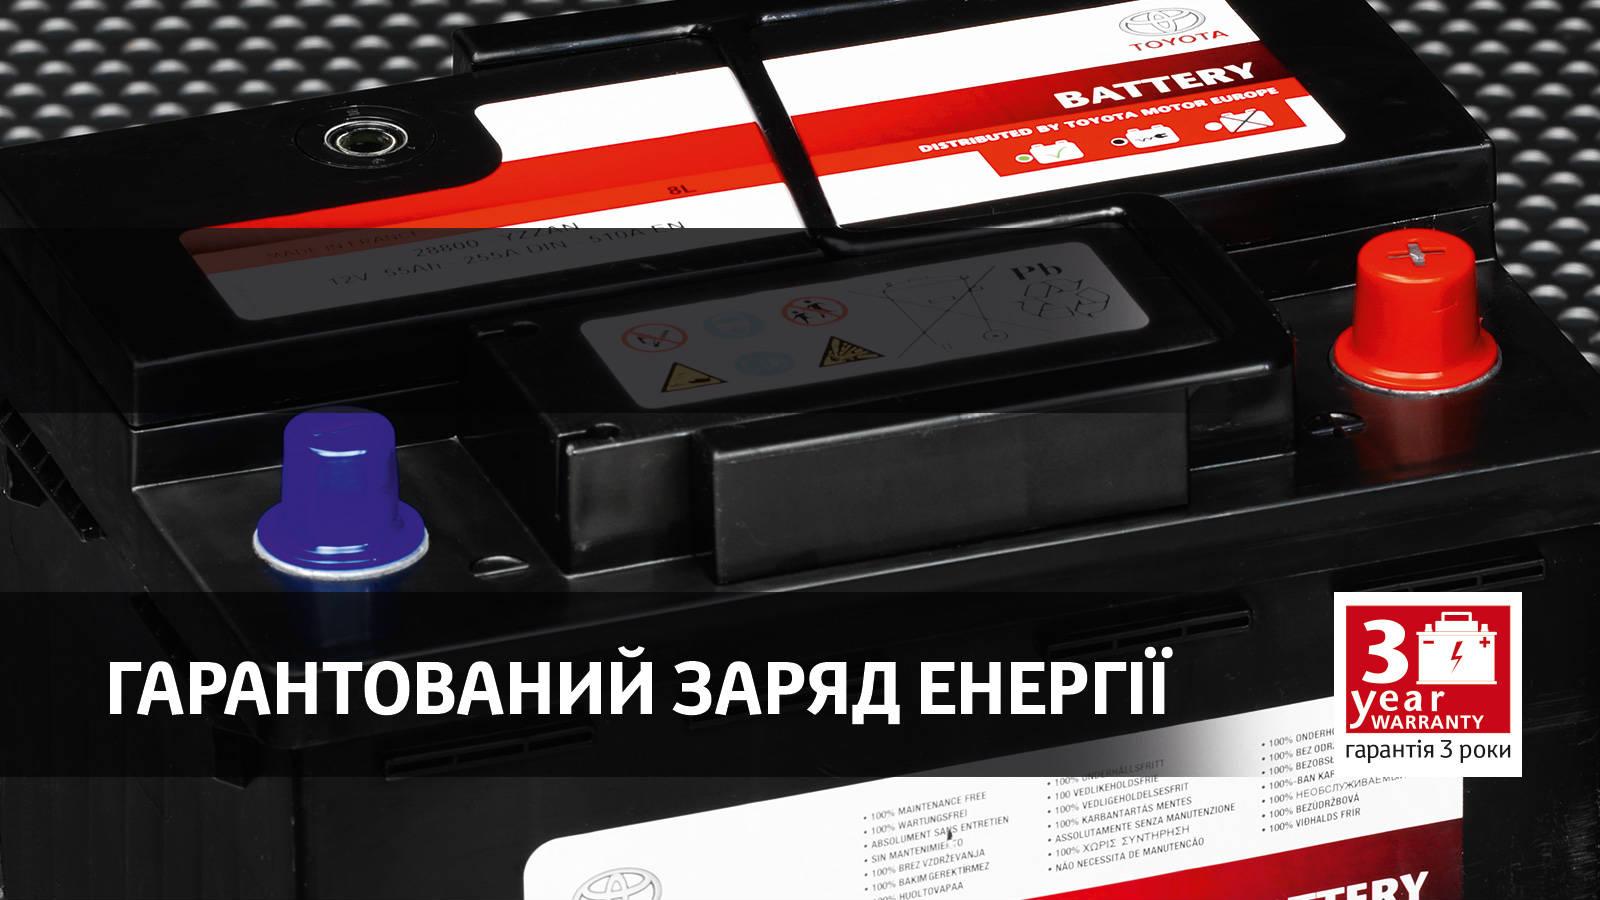 toyota_originalni_akb_1600x900_tcm_3046_896653